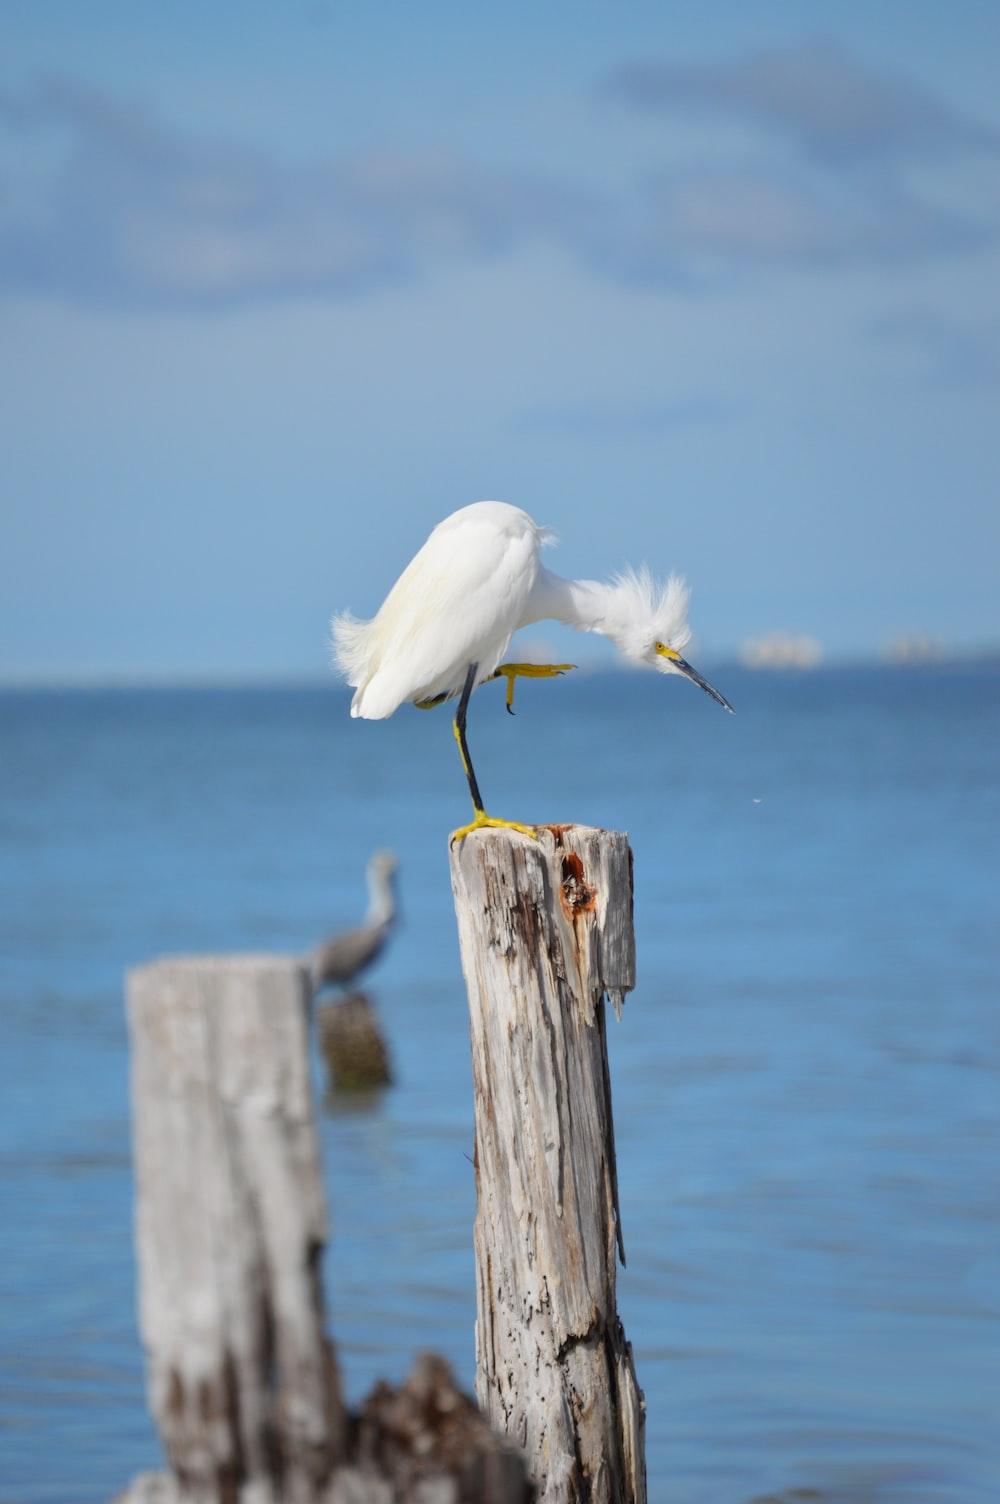 white bird on brown wooden post near sea during daytime